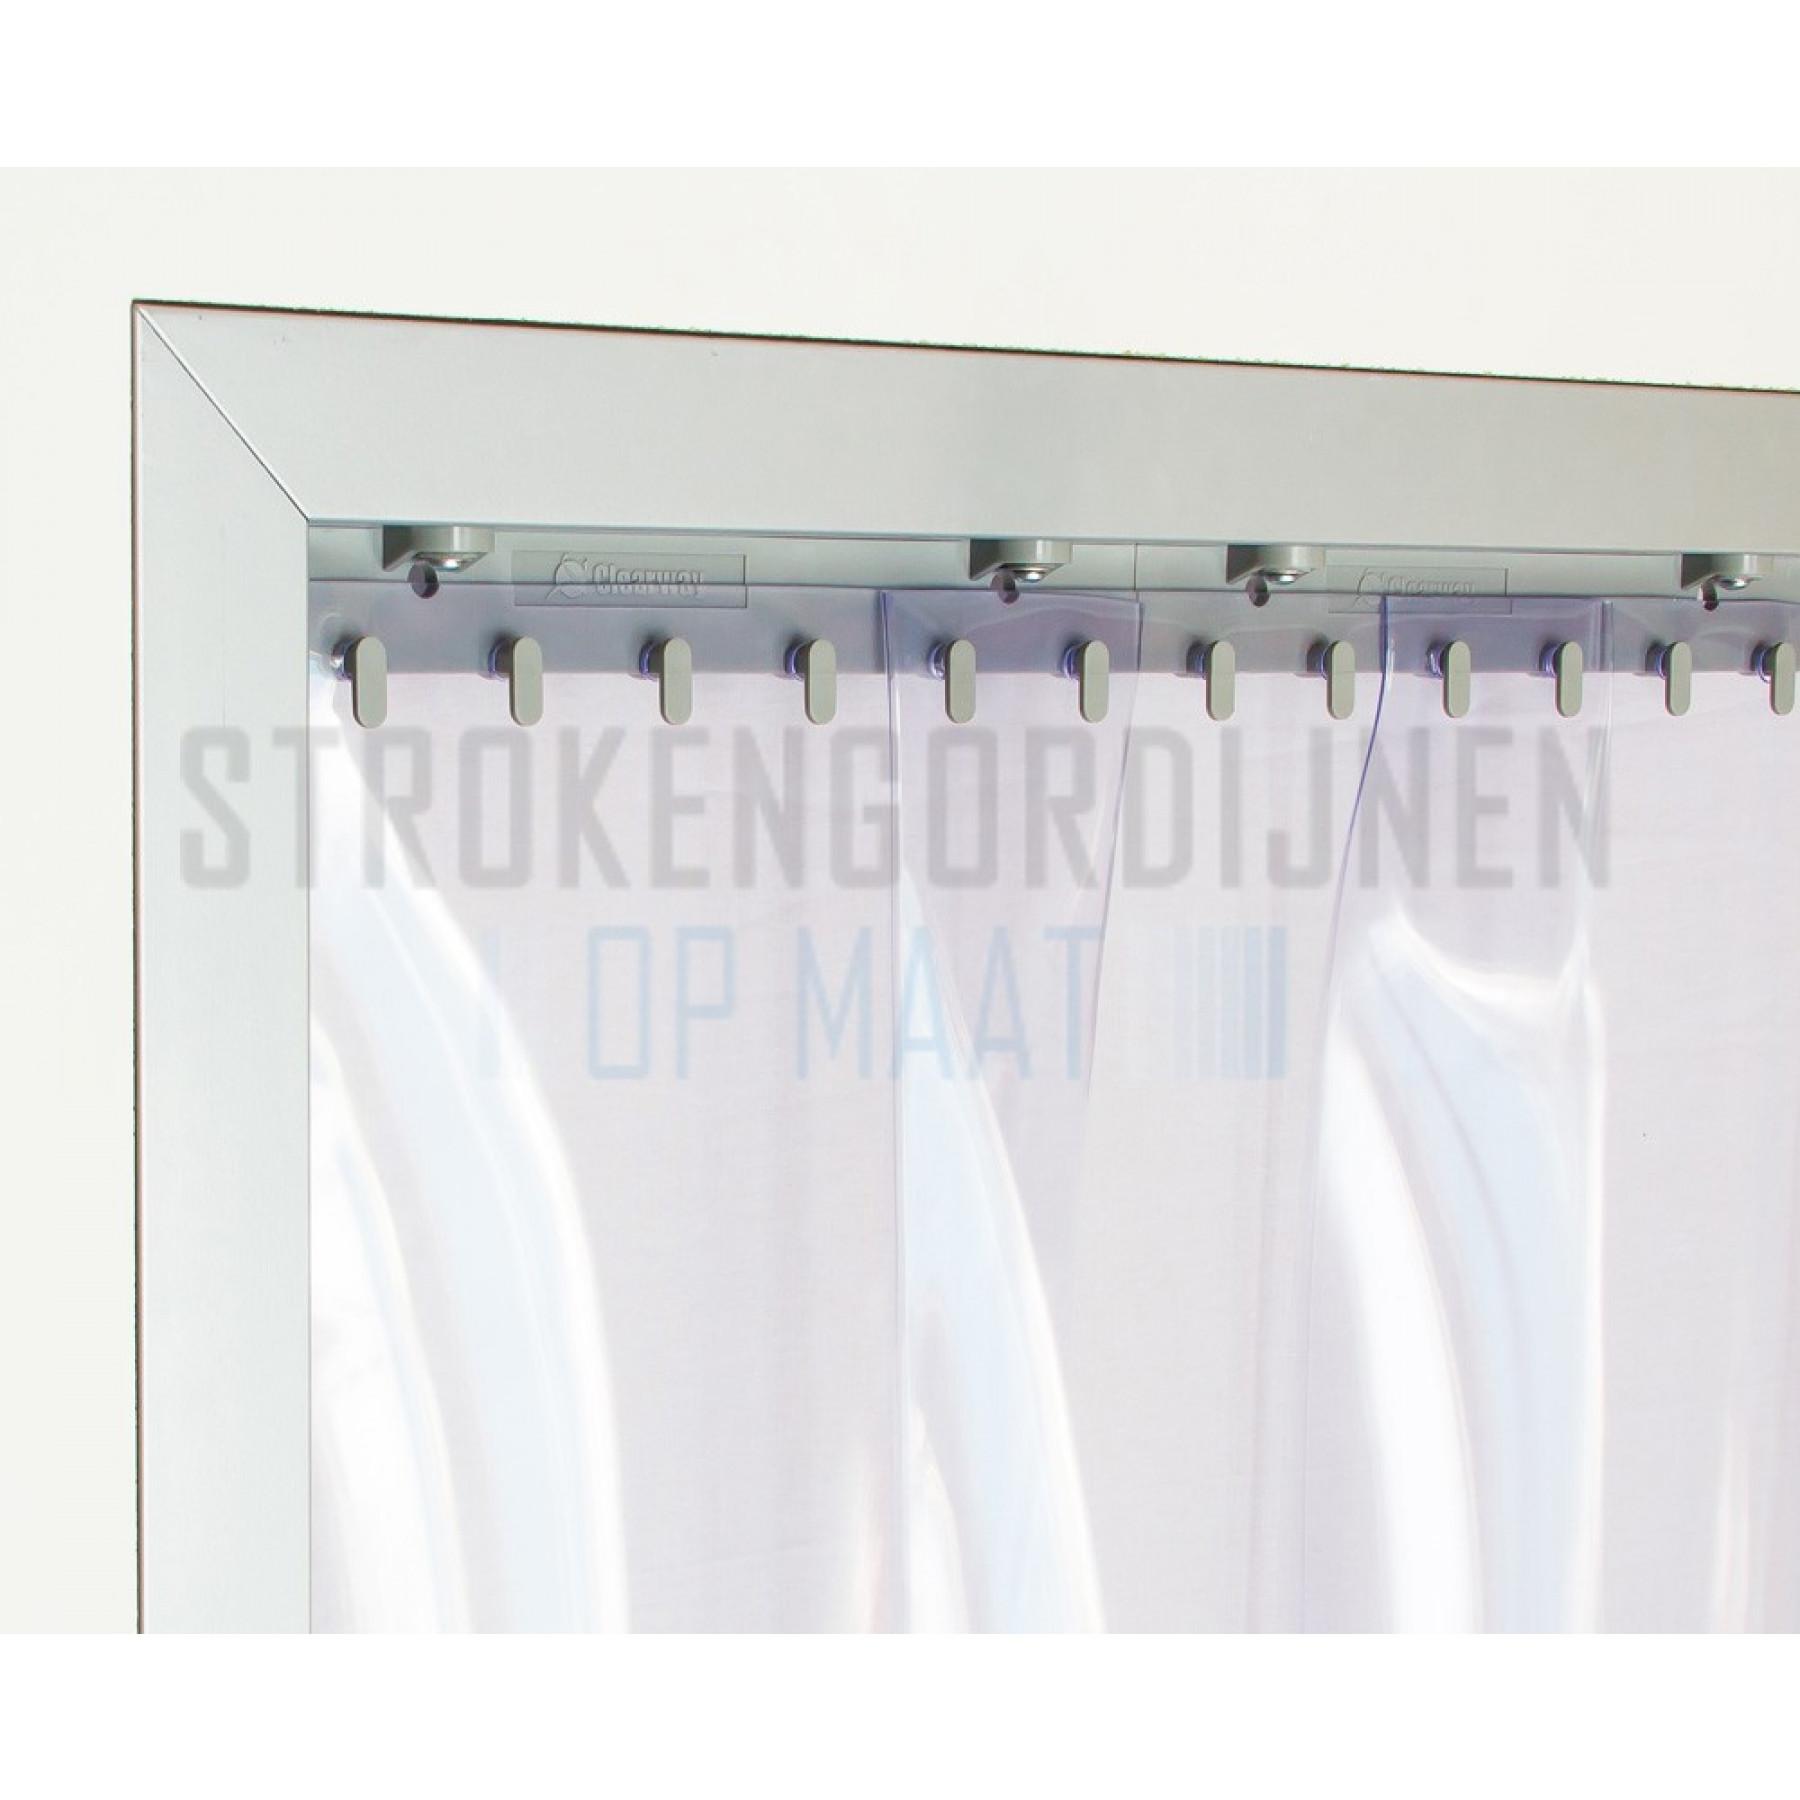 PVC op rol, Food Safe, 300mm breed, 3mm dik, 50 meter lengte, transparant